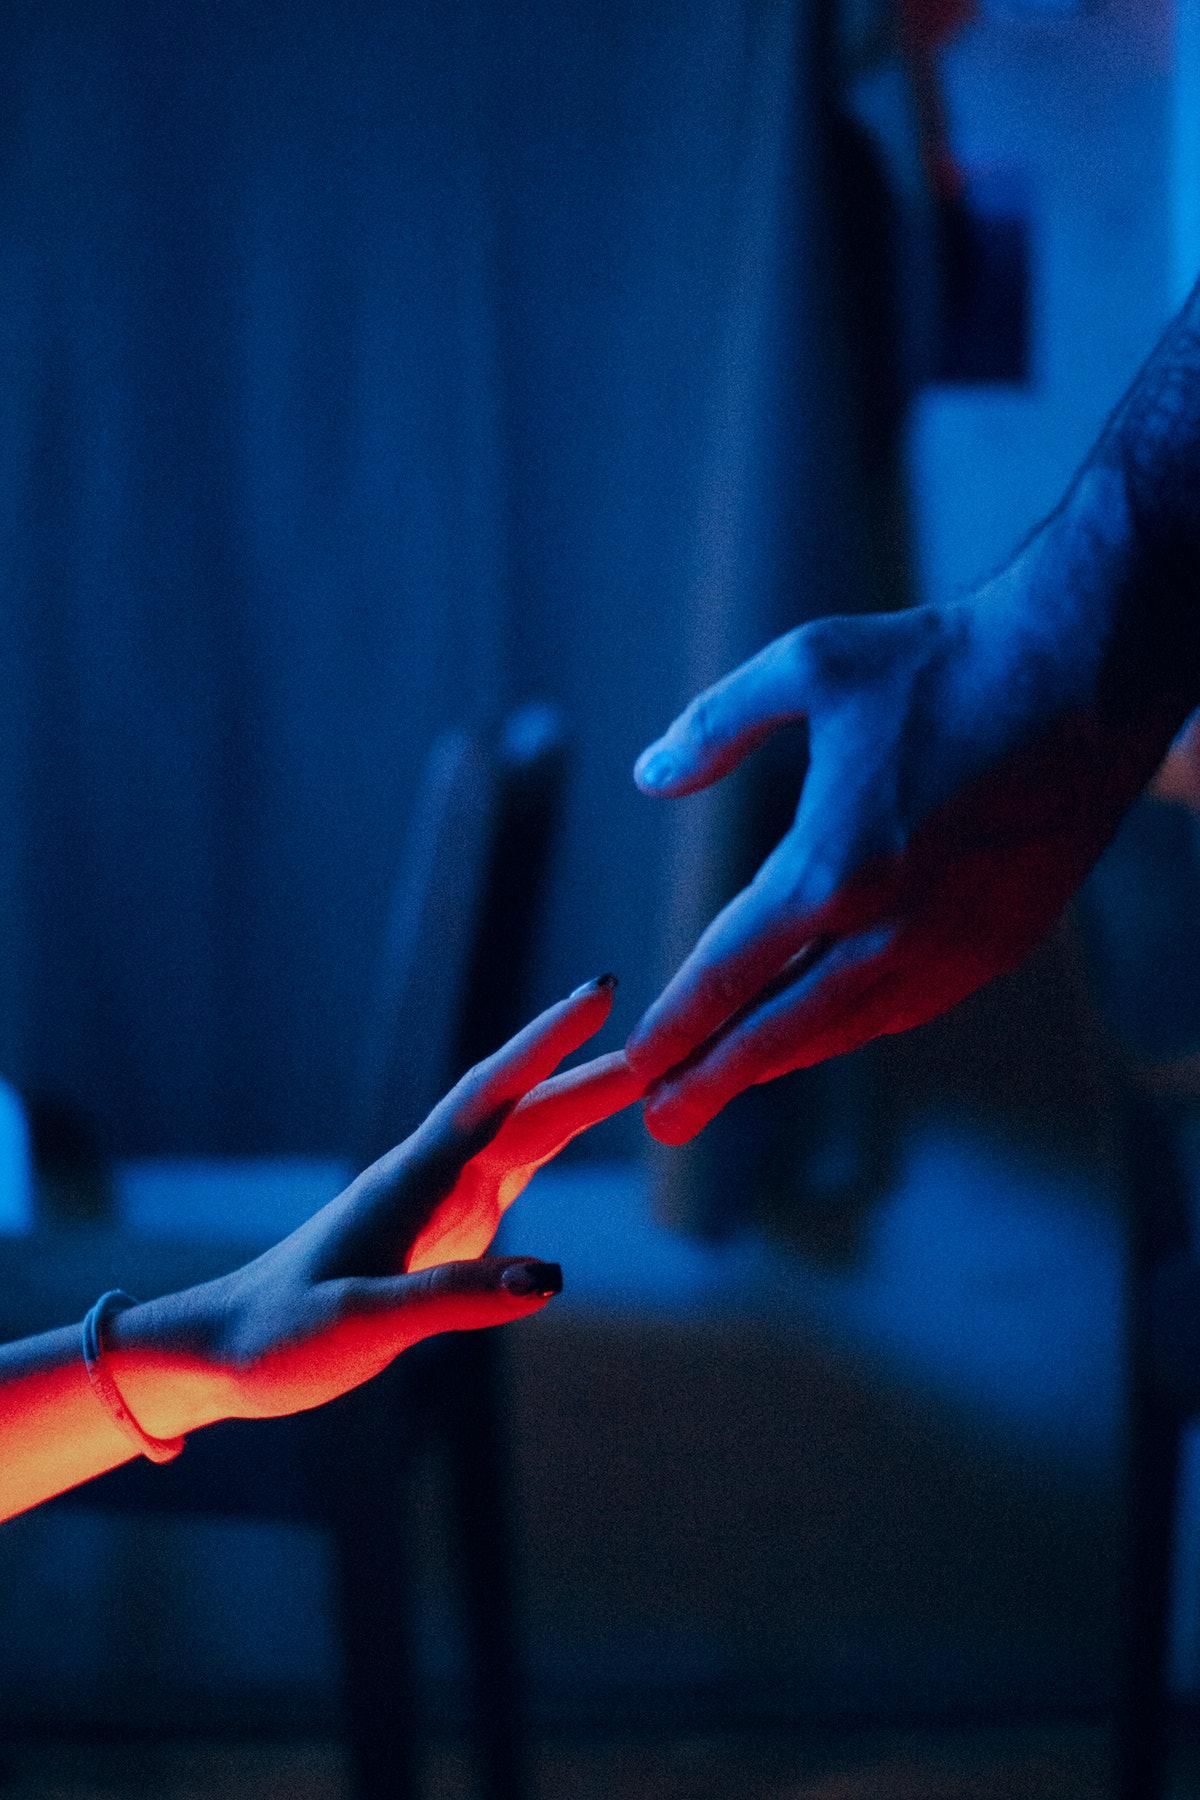 Couple touching hands amid Mercury retrograde spring 2021.